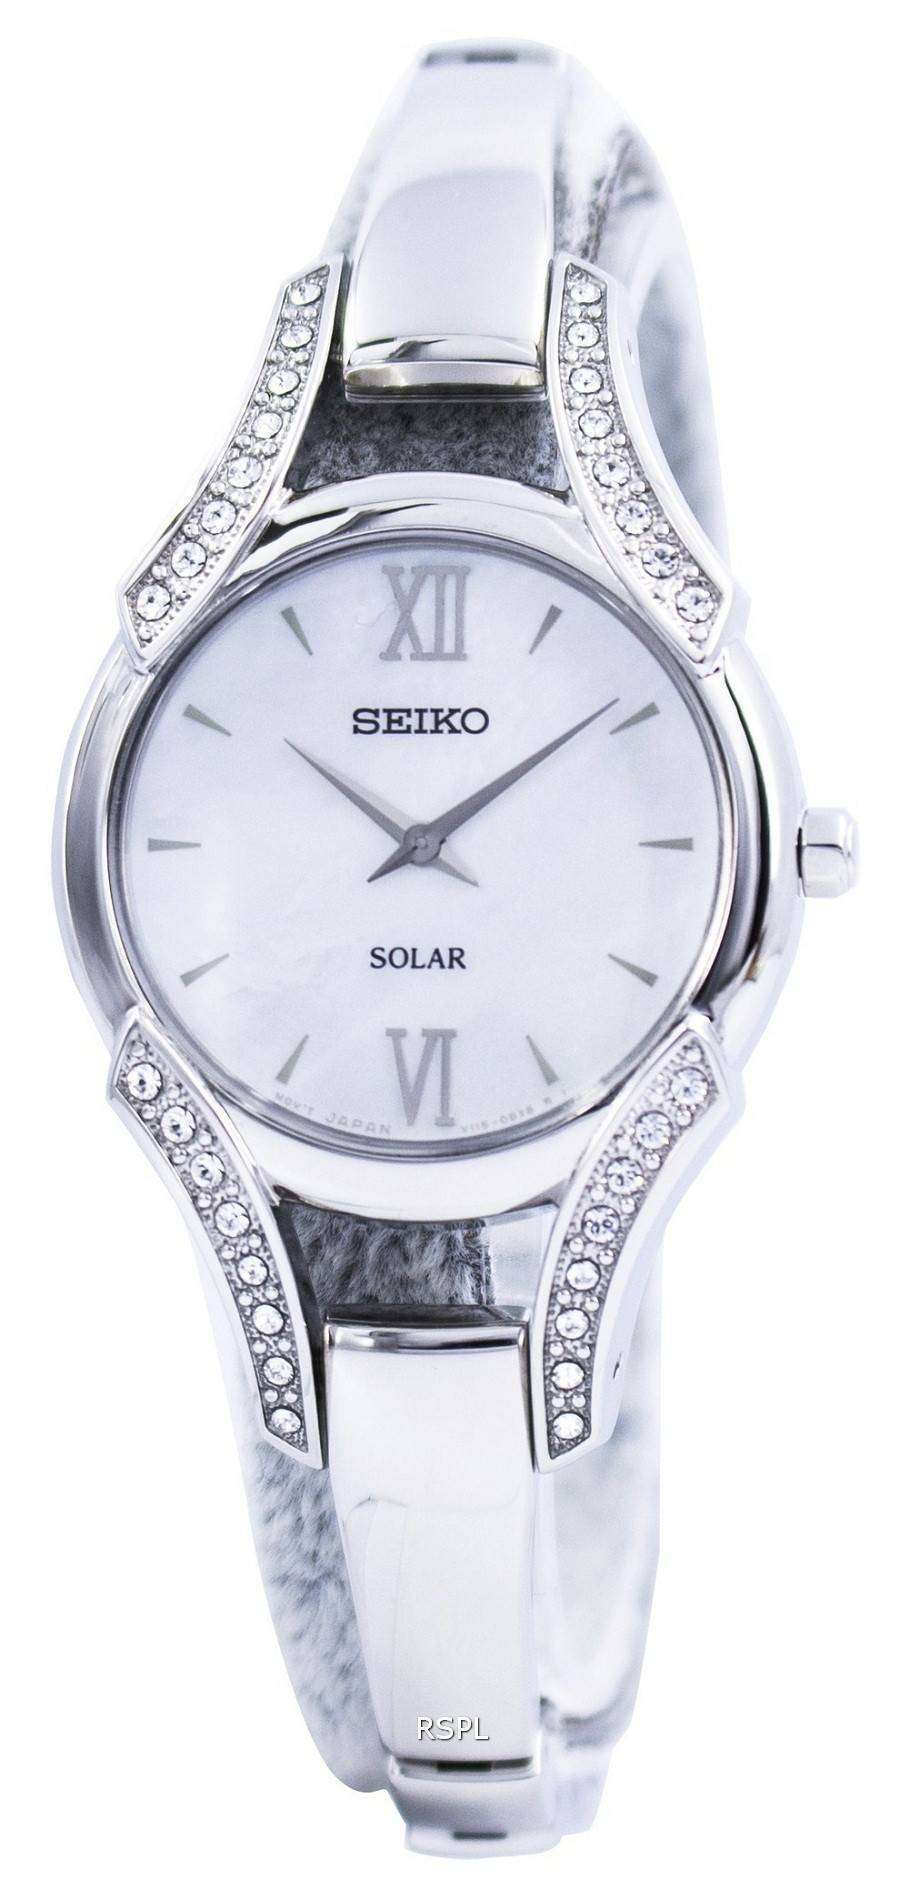 Seiko solar swarovski crystals sup213 sup213p1 sup213p womens watch for Swarovski crystals watch